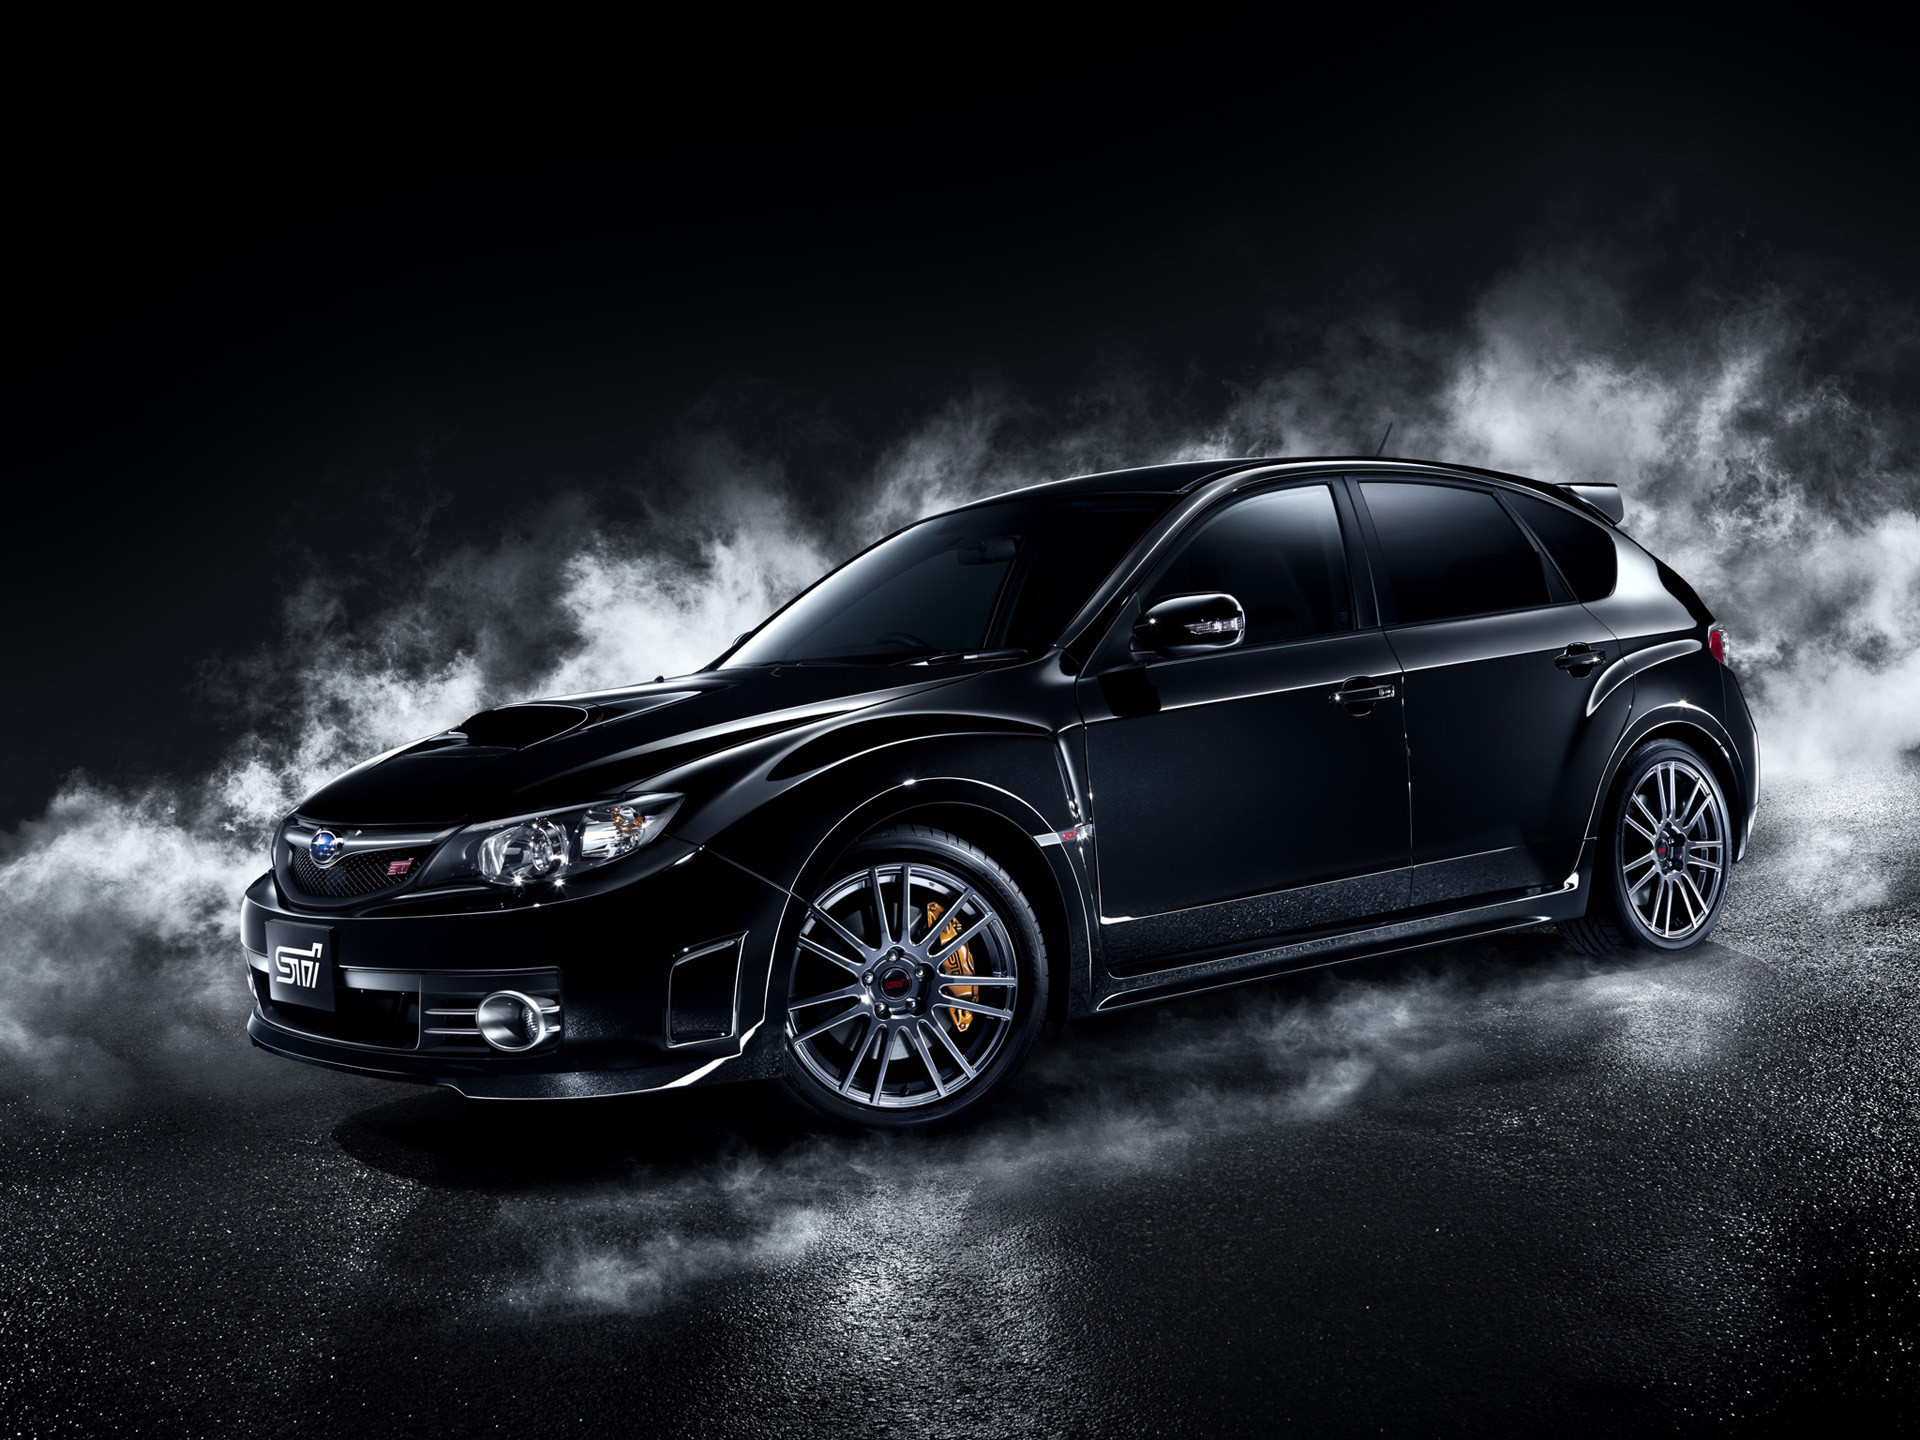 2010 Subaru Impreza WRX STI A-Line g wallpaper | | 206891 |  WallpaperUP